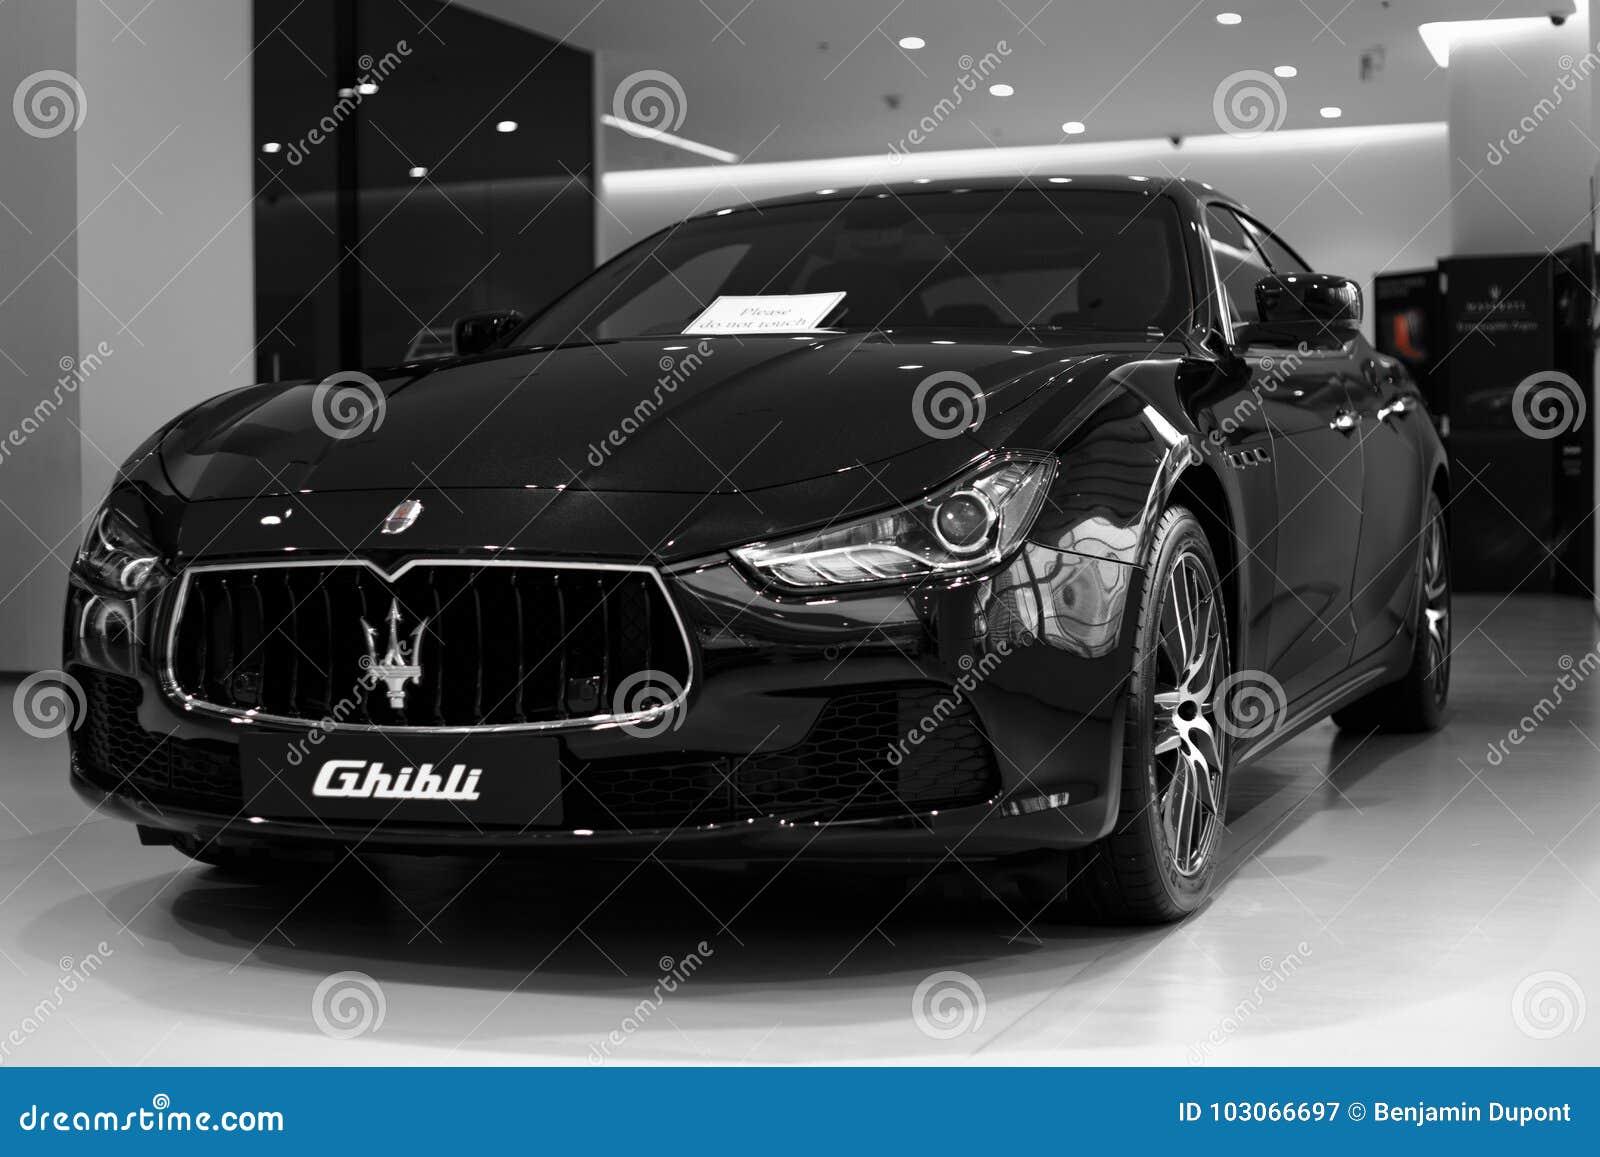 501 Black Maserati Photos Free Royalty Free Stock Photos From Dreamstime